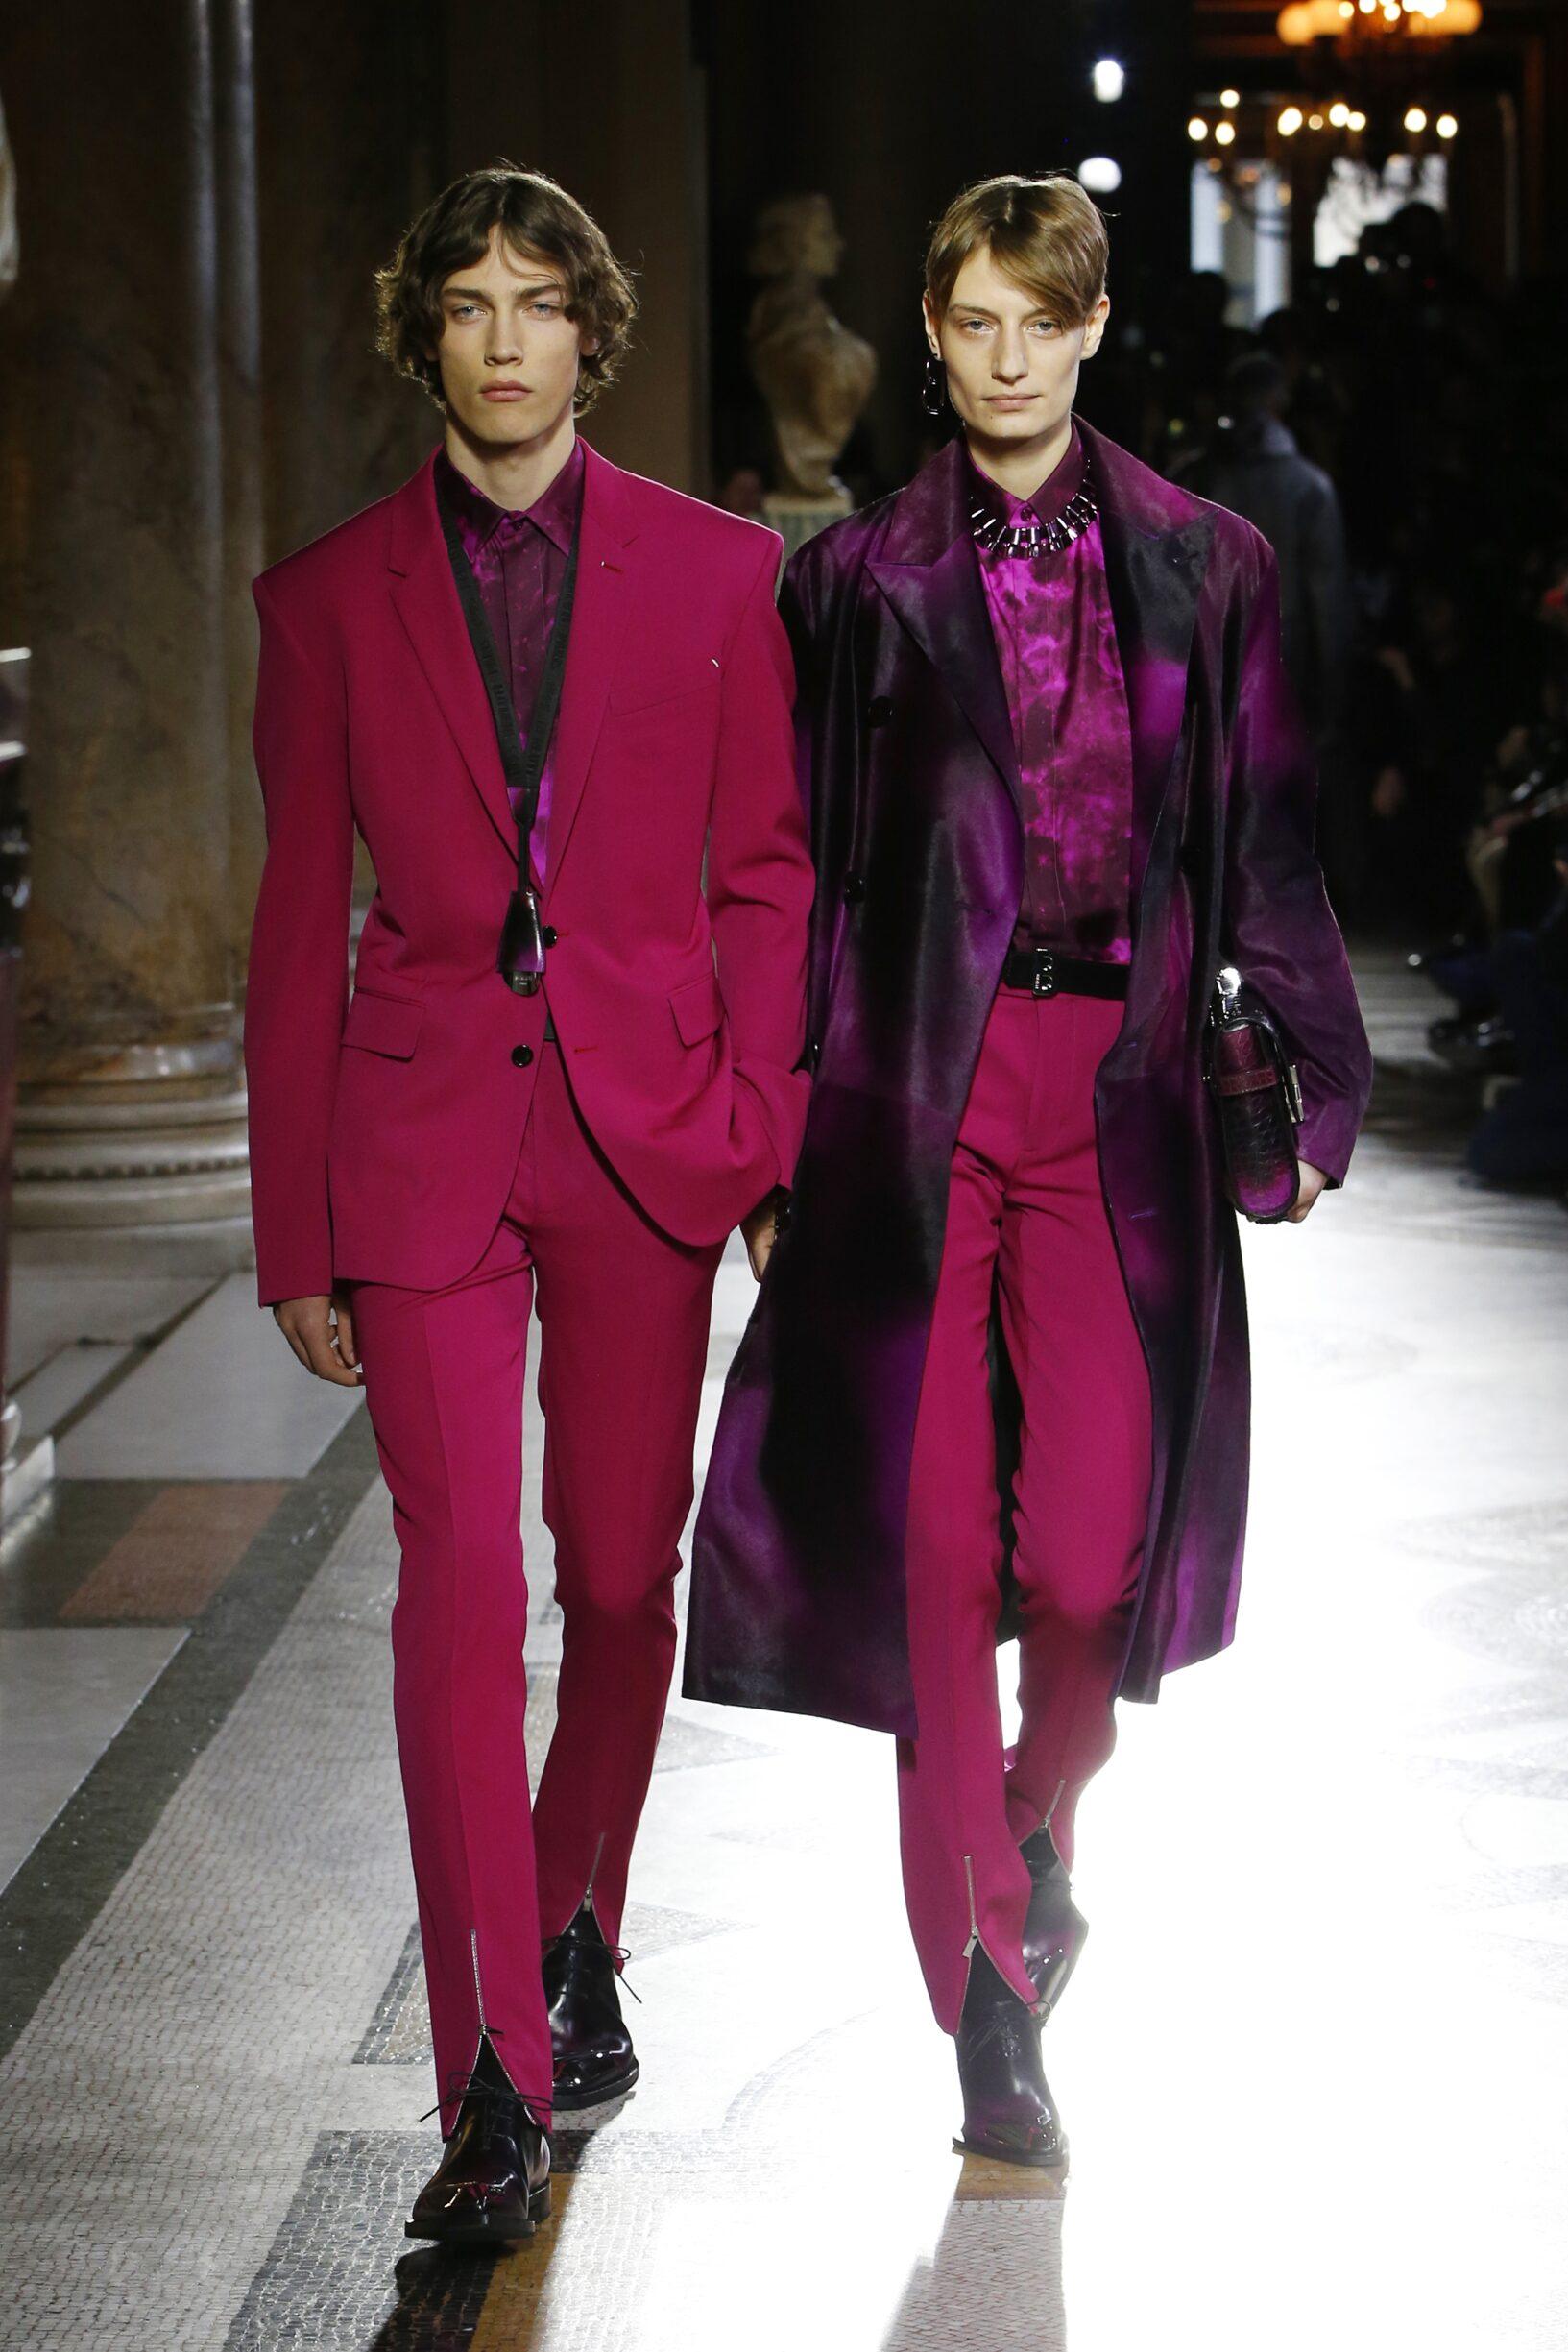 Fashion Show Models Berluti Catwalk